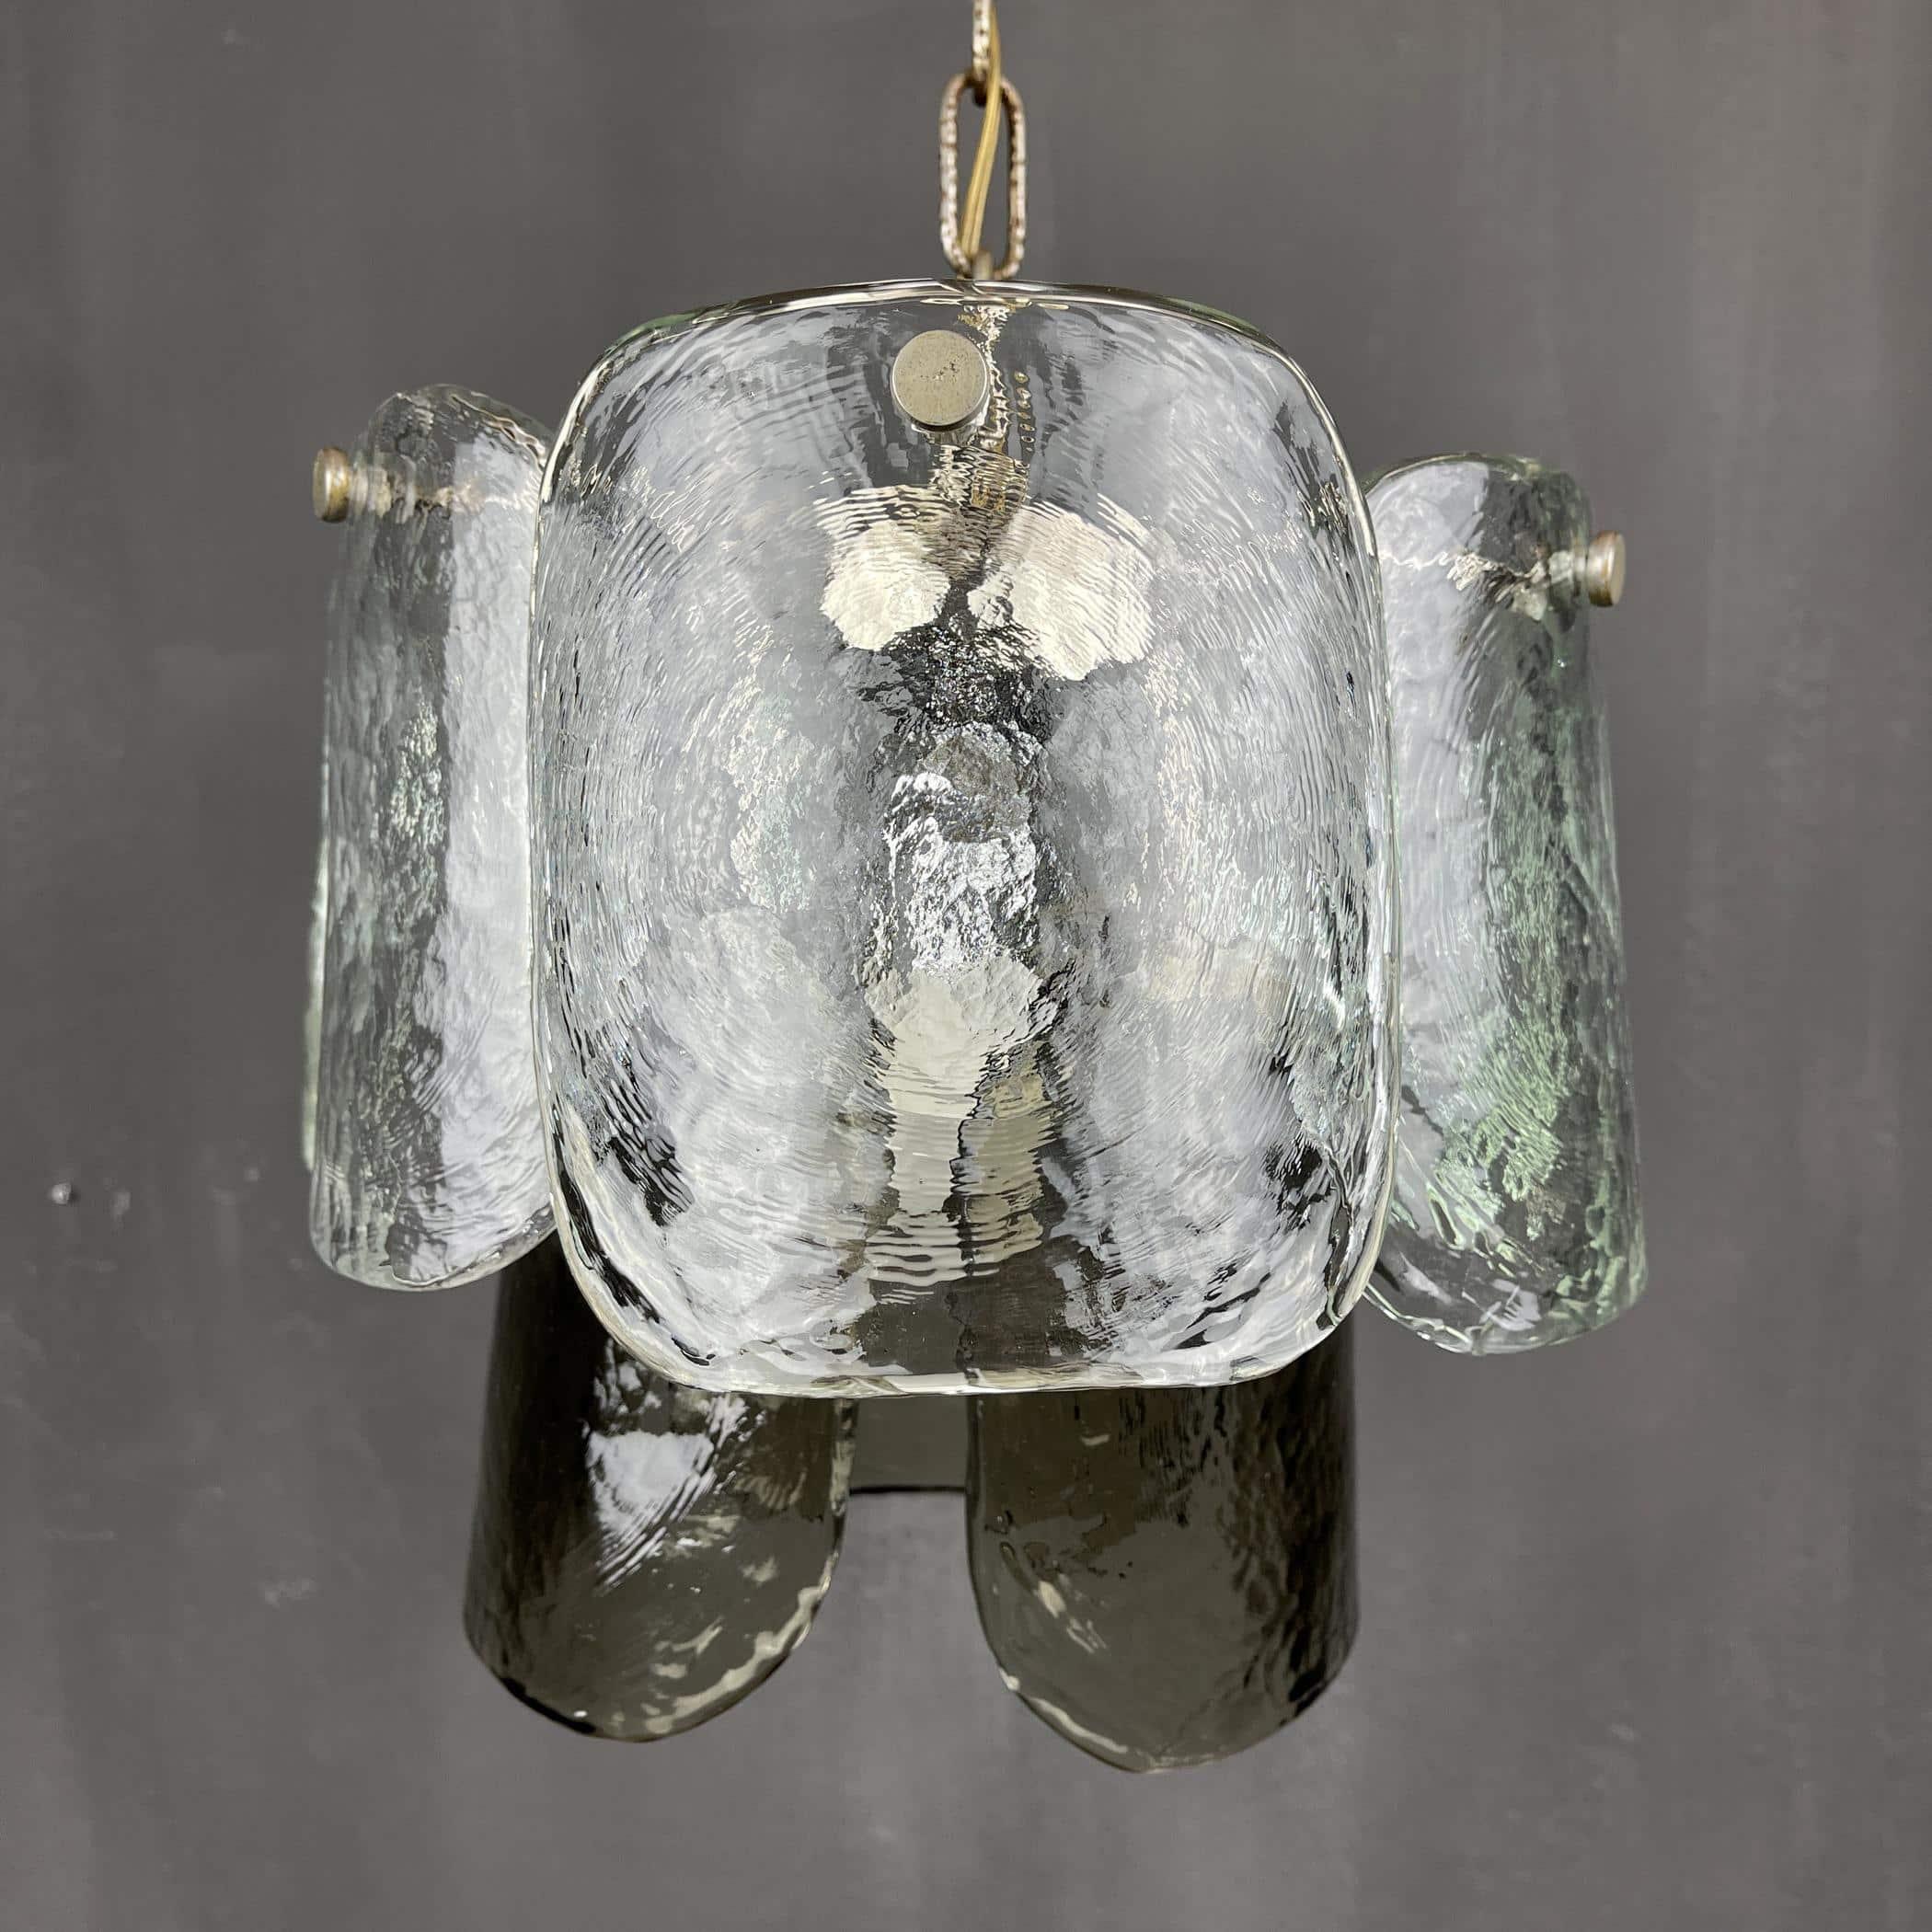 Iced murano glass chandelier by Carlo Nason for Mazzega Italy 1960s Art Murano glass handmade murano glass